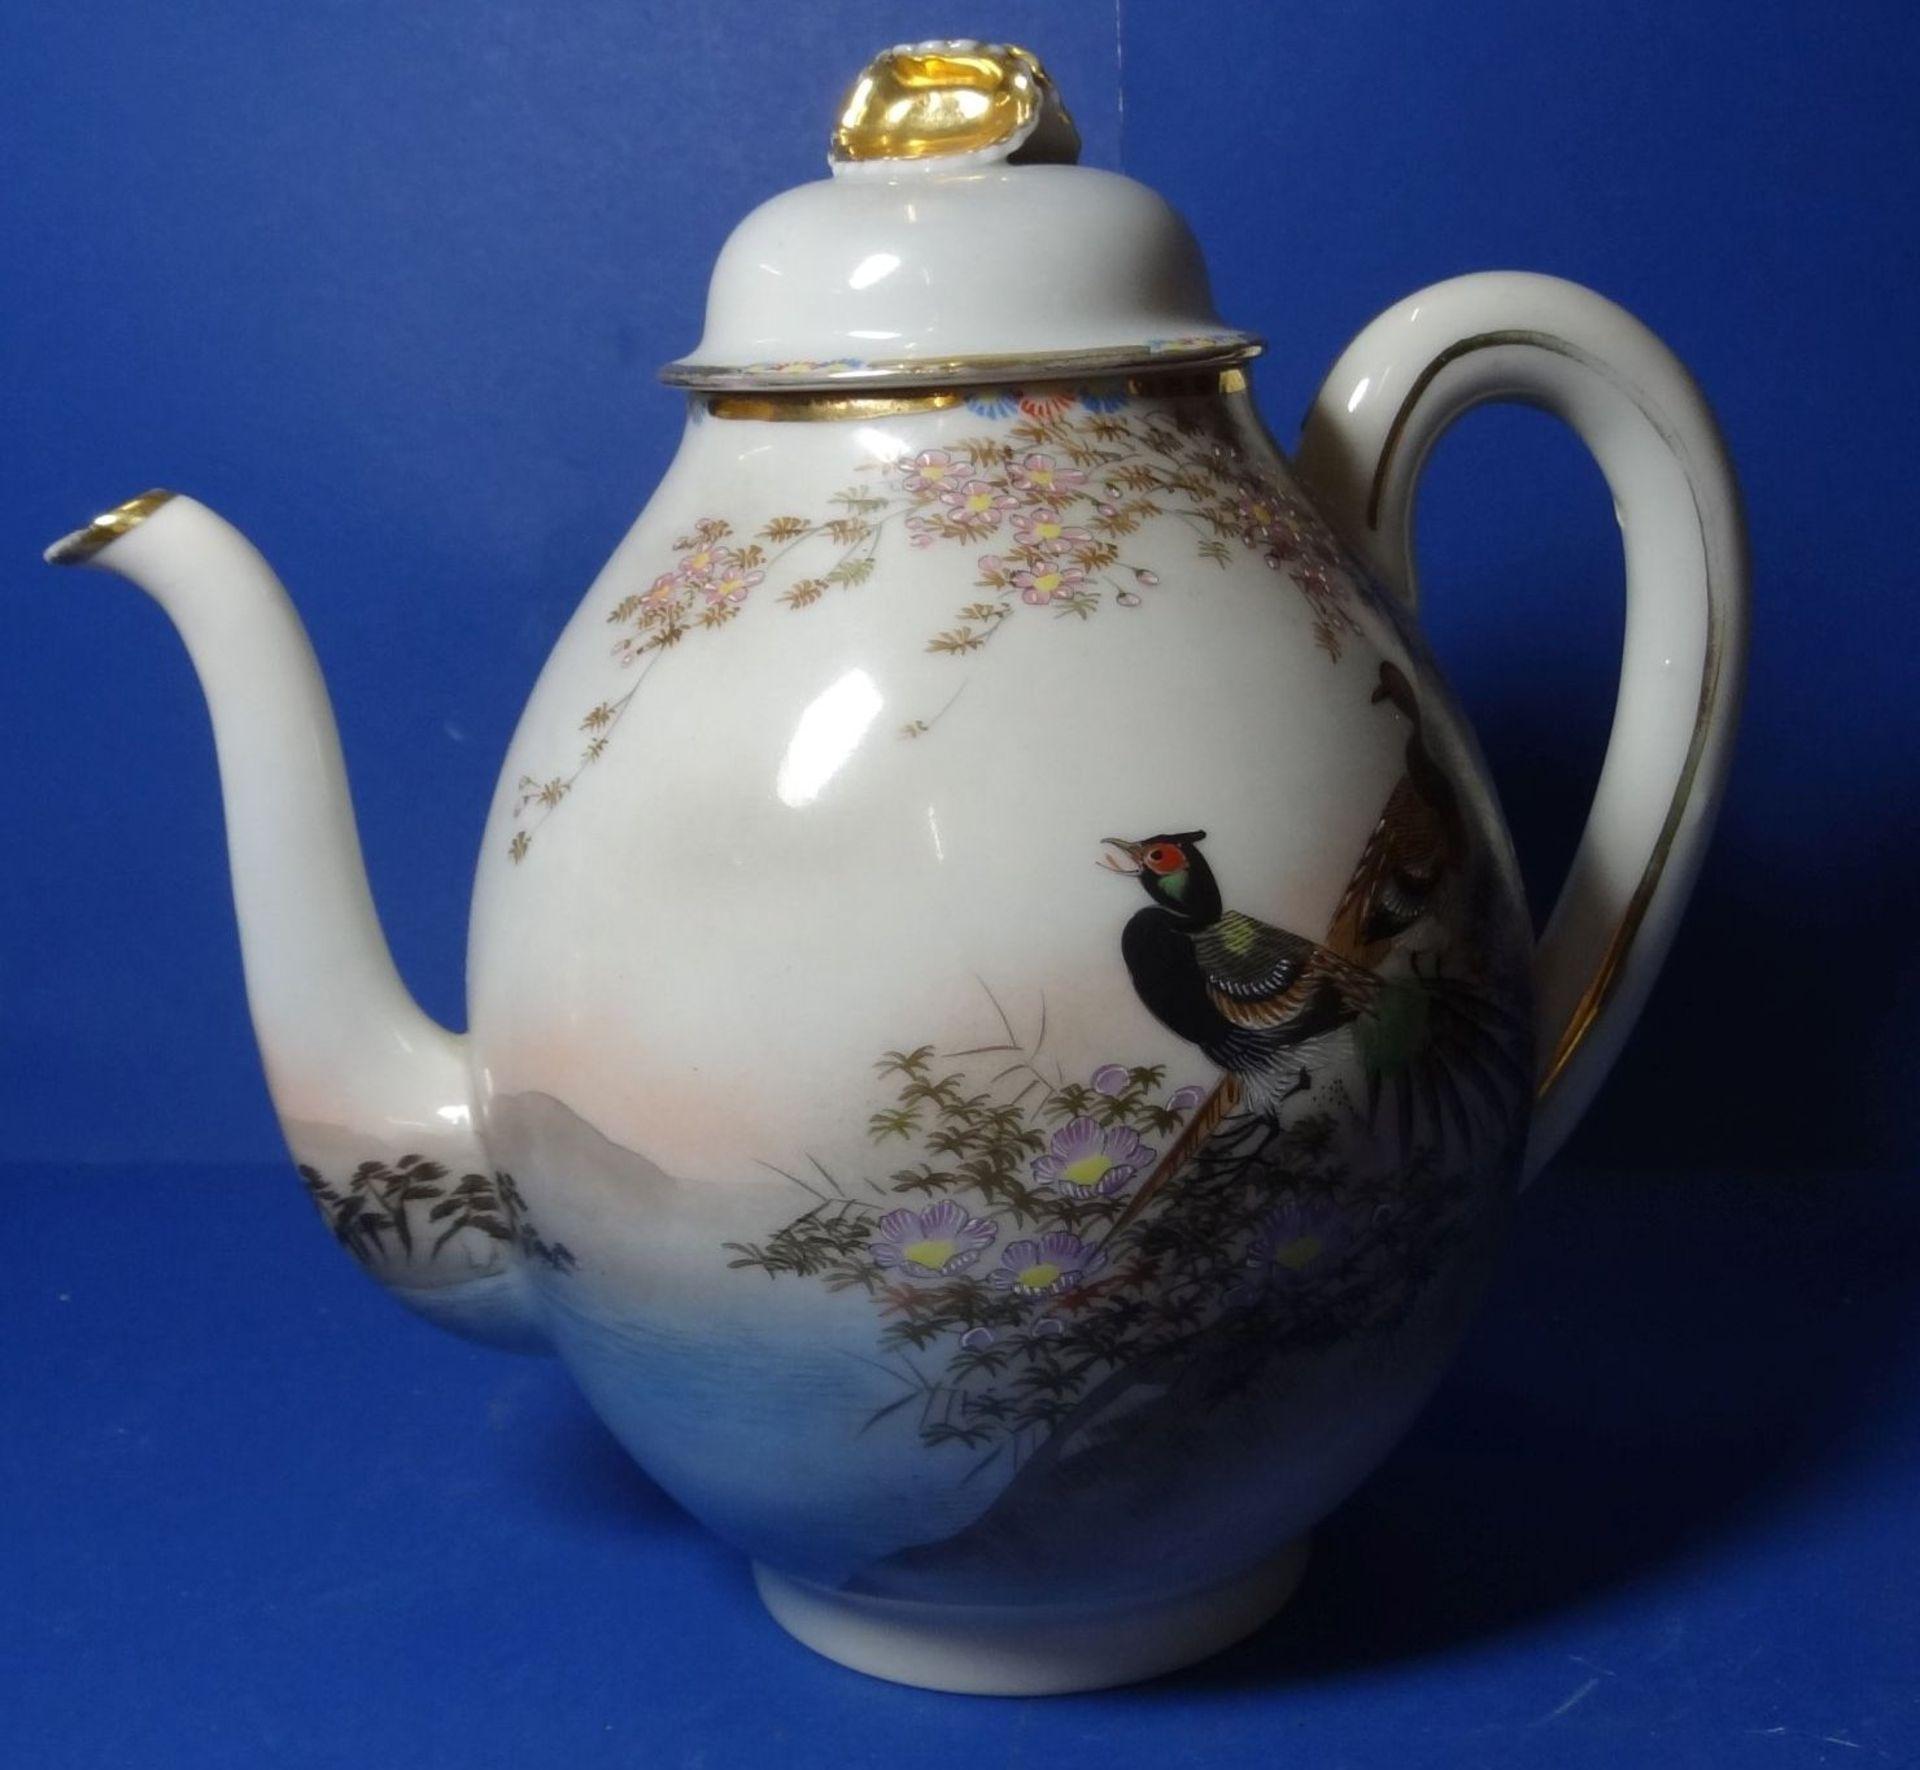 Los 1036 - Japan. Teekern mit 5 Kuchentellern, handbemalt, Fudjiyama-Motive, älte